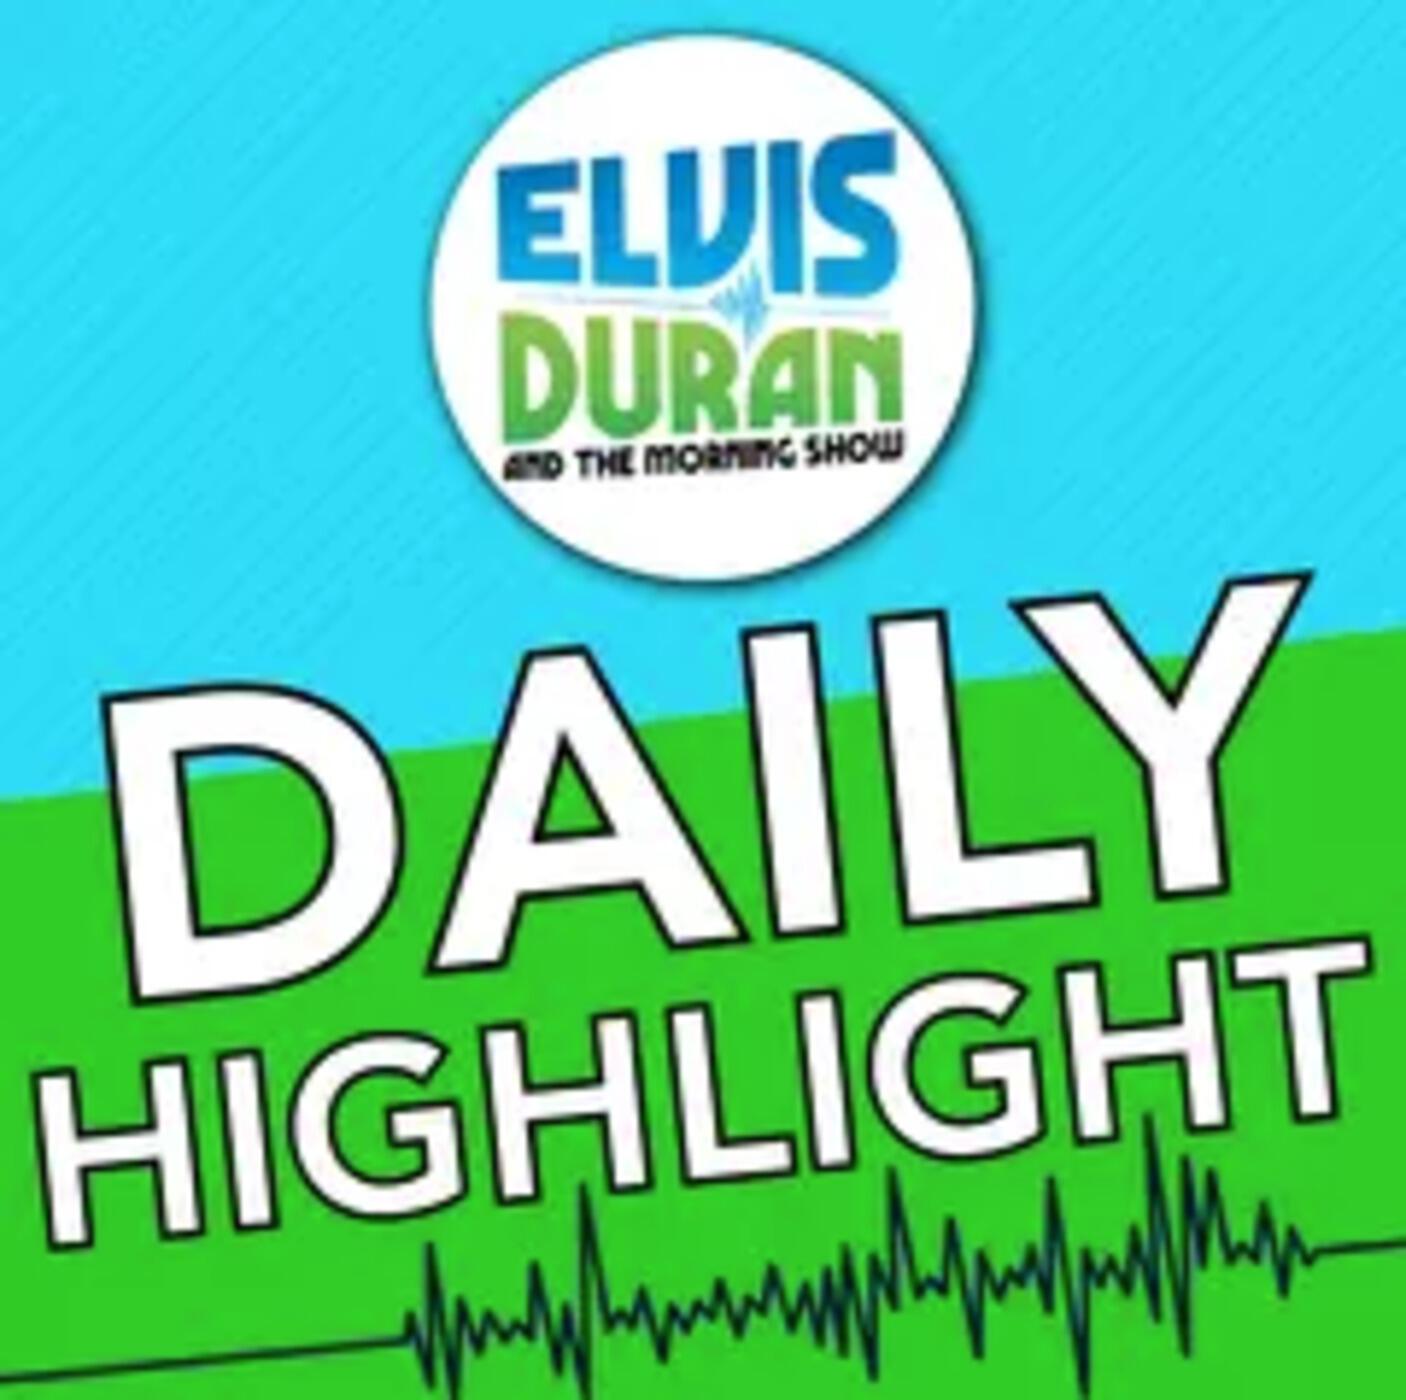 The Elvis Duran Show